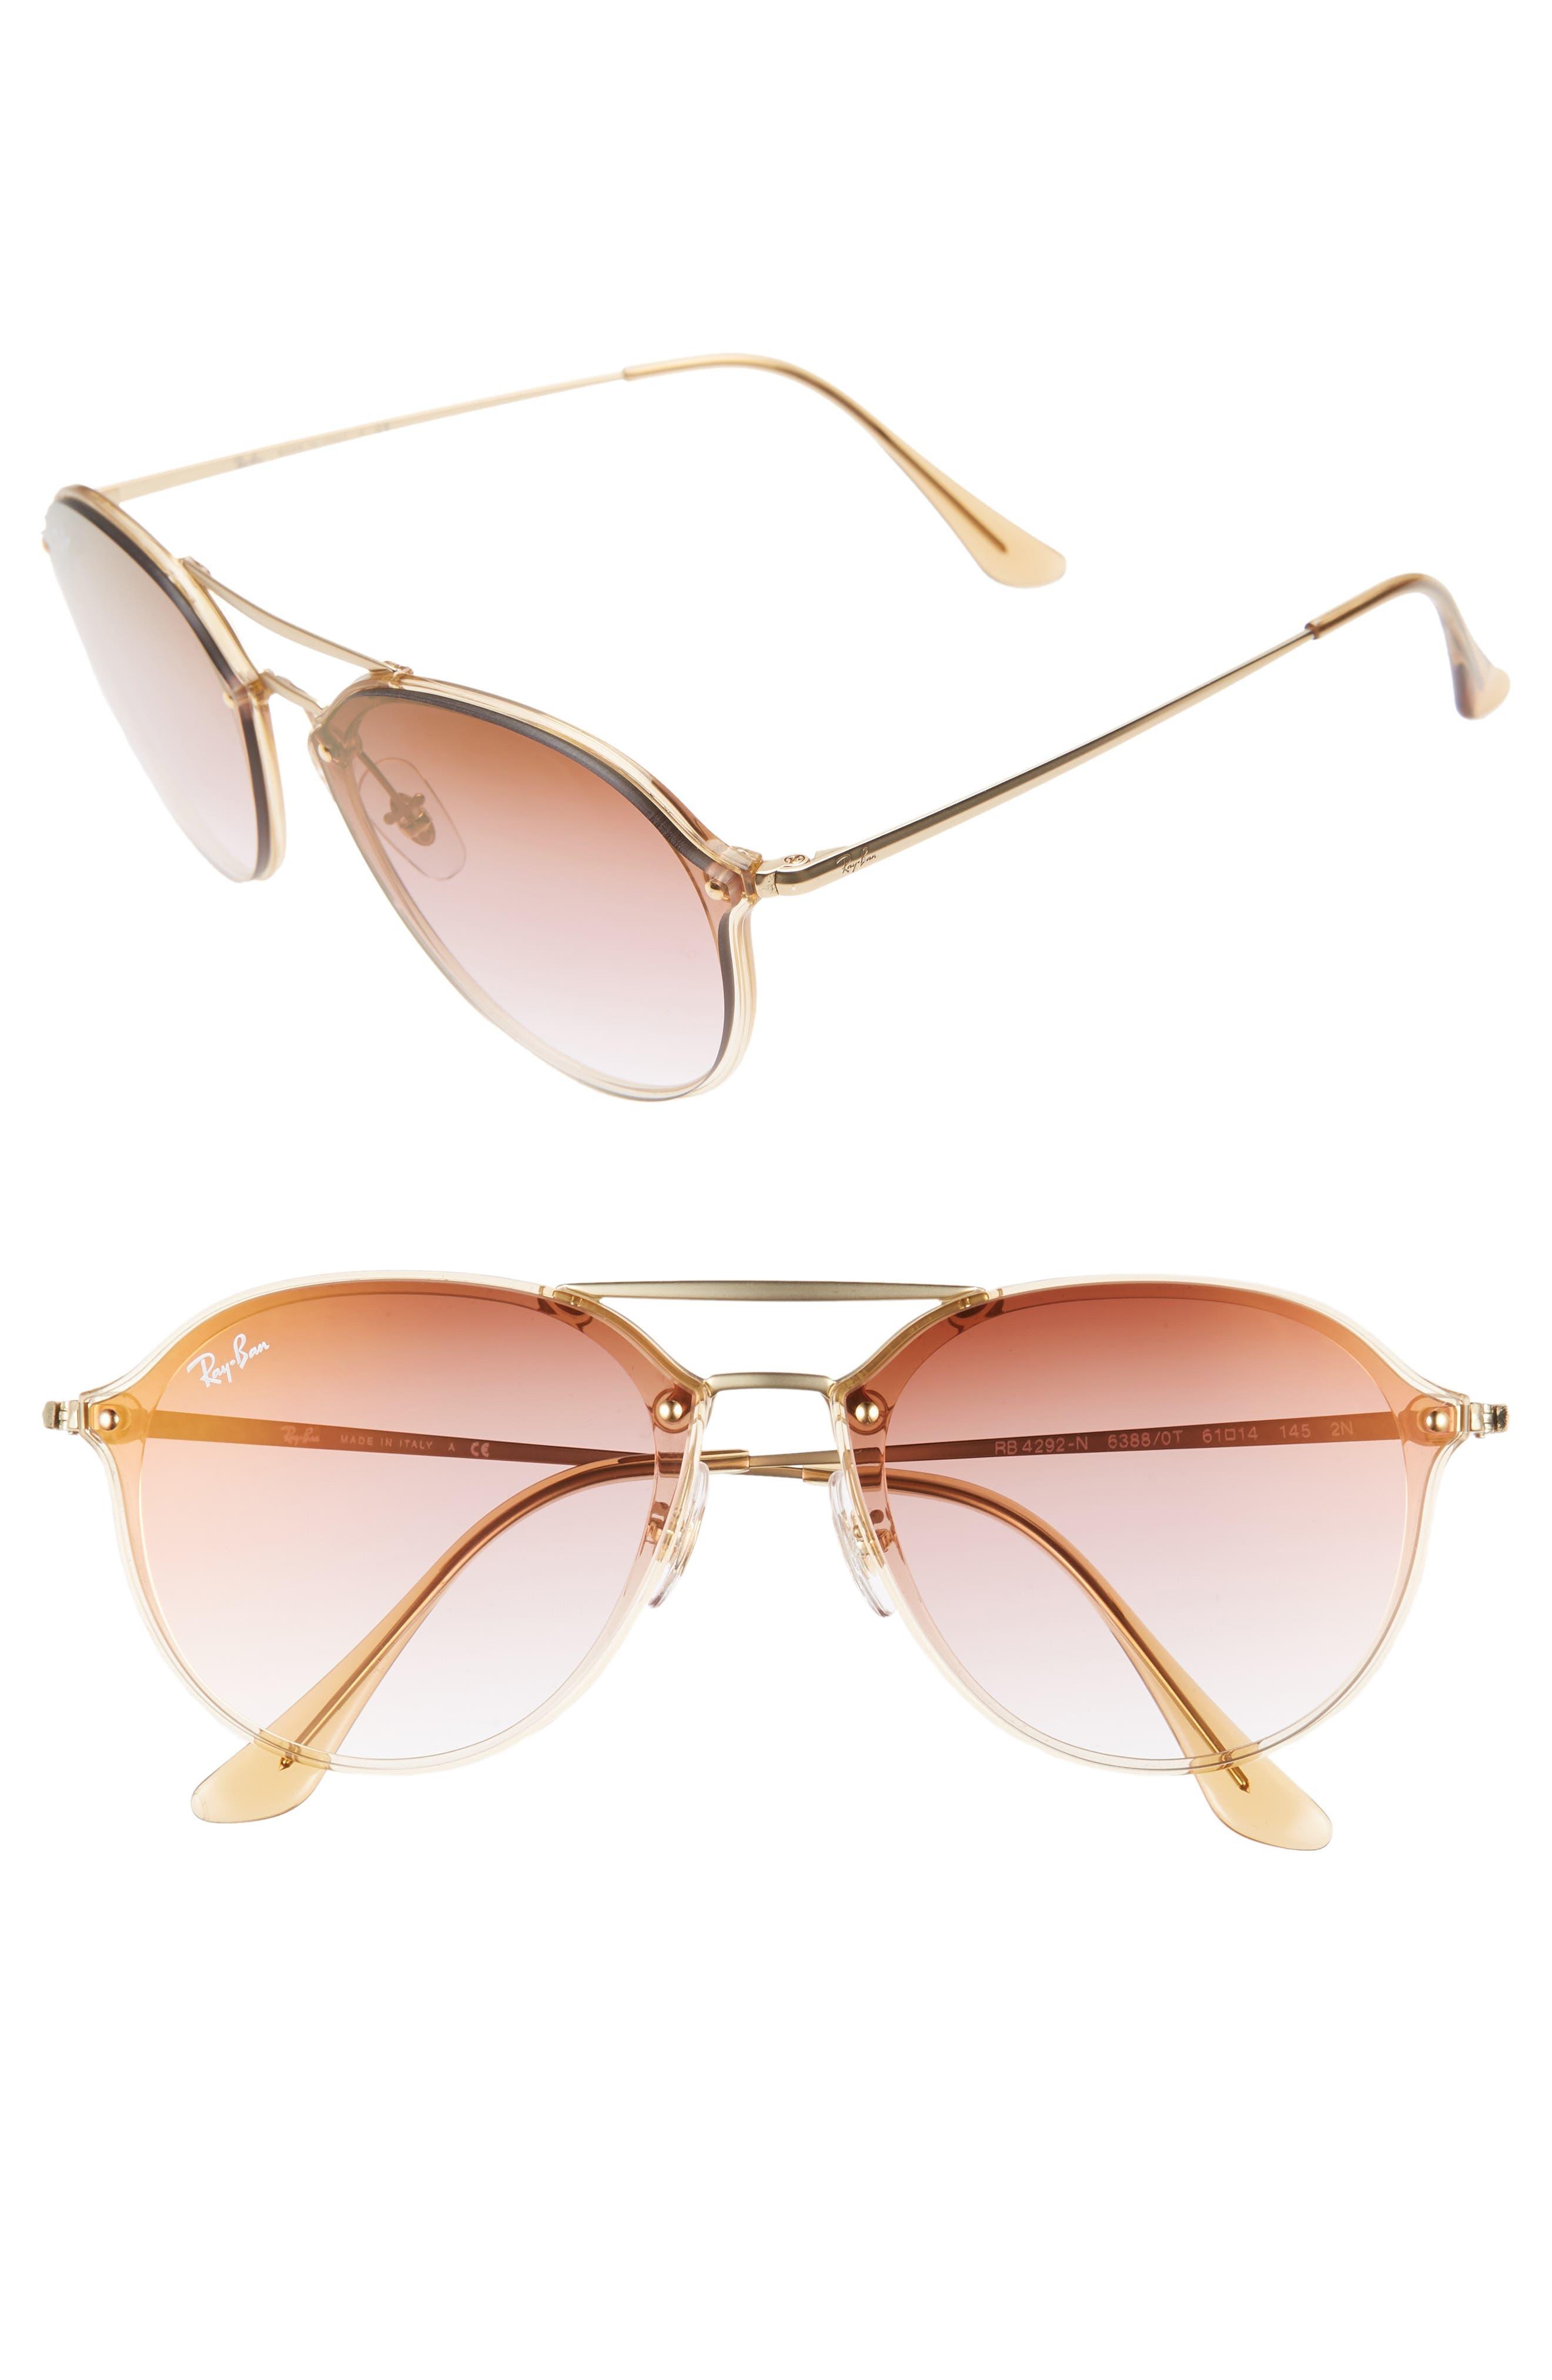 Ray-Ban 61Mm Gradient Aviator Sunglasses - Gold/ Brown Gradient